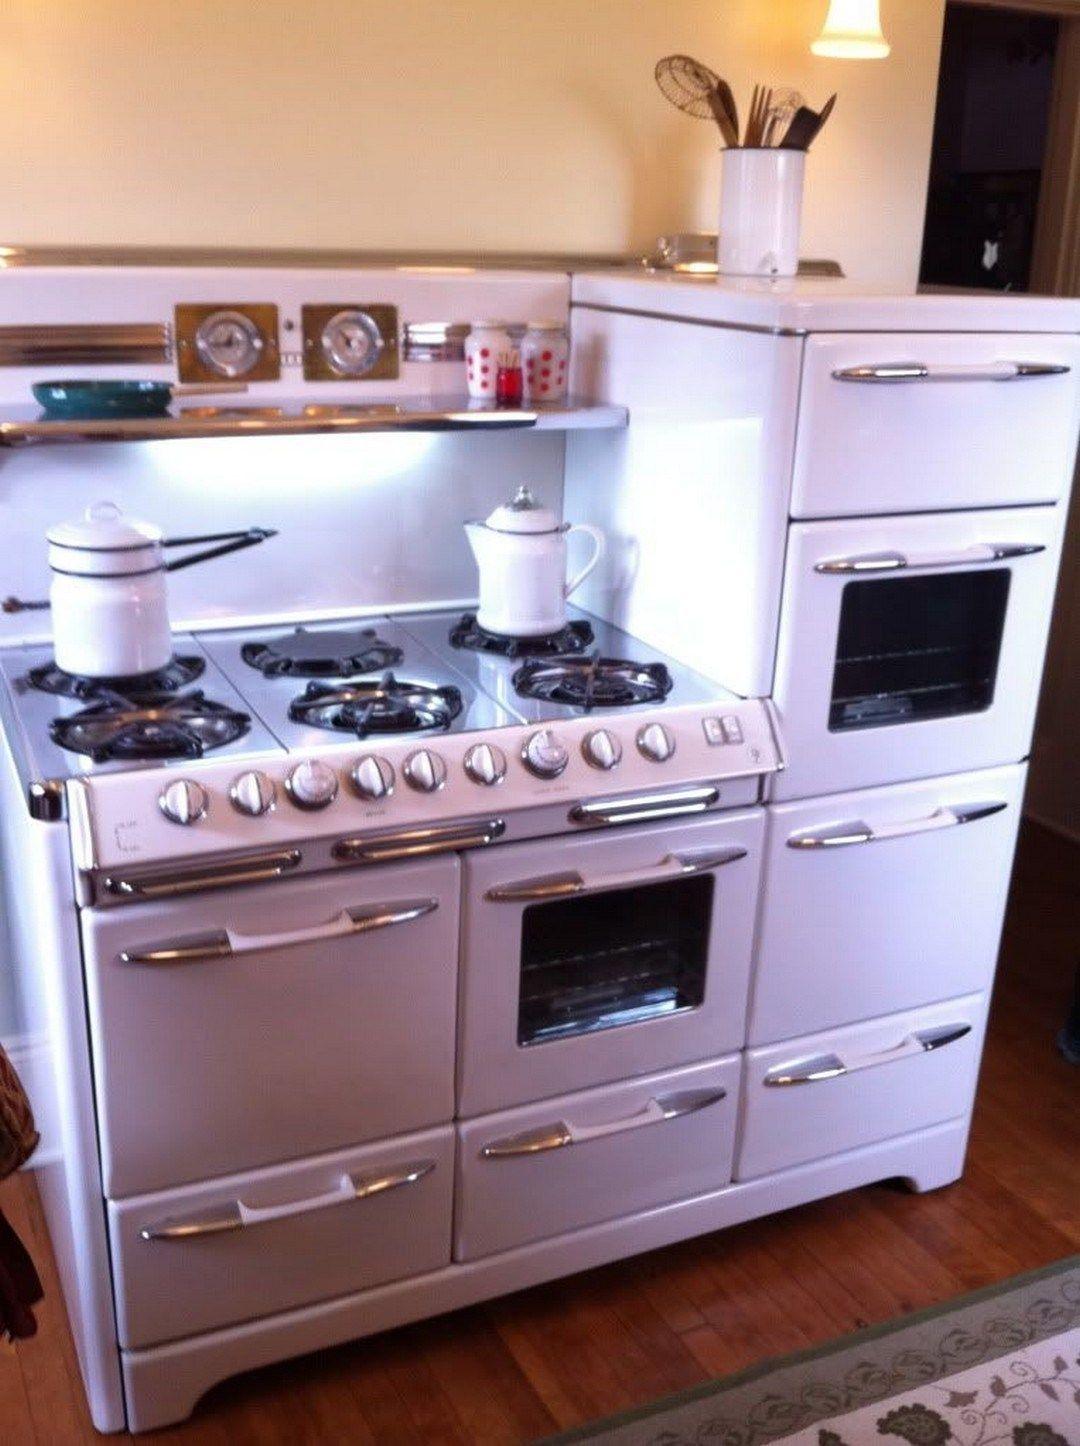 Home Decor Vintage Kitchen Appliances Vintage Stoves Vintage Style Kitchen